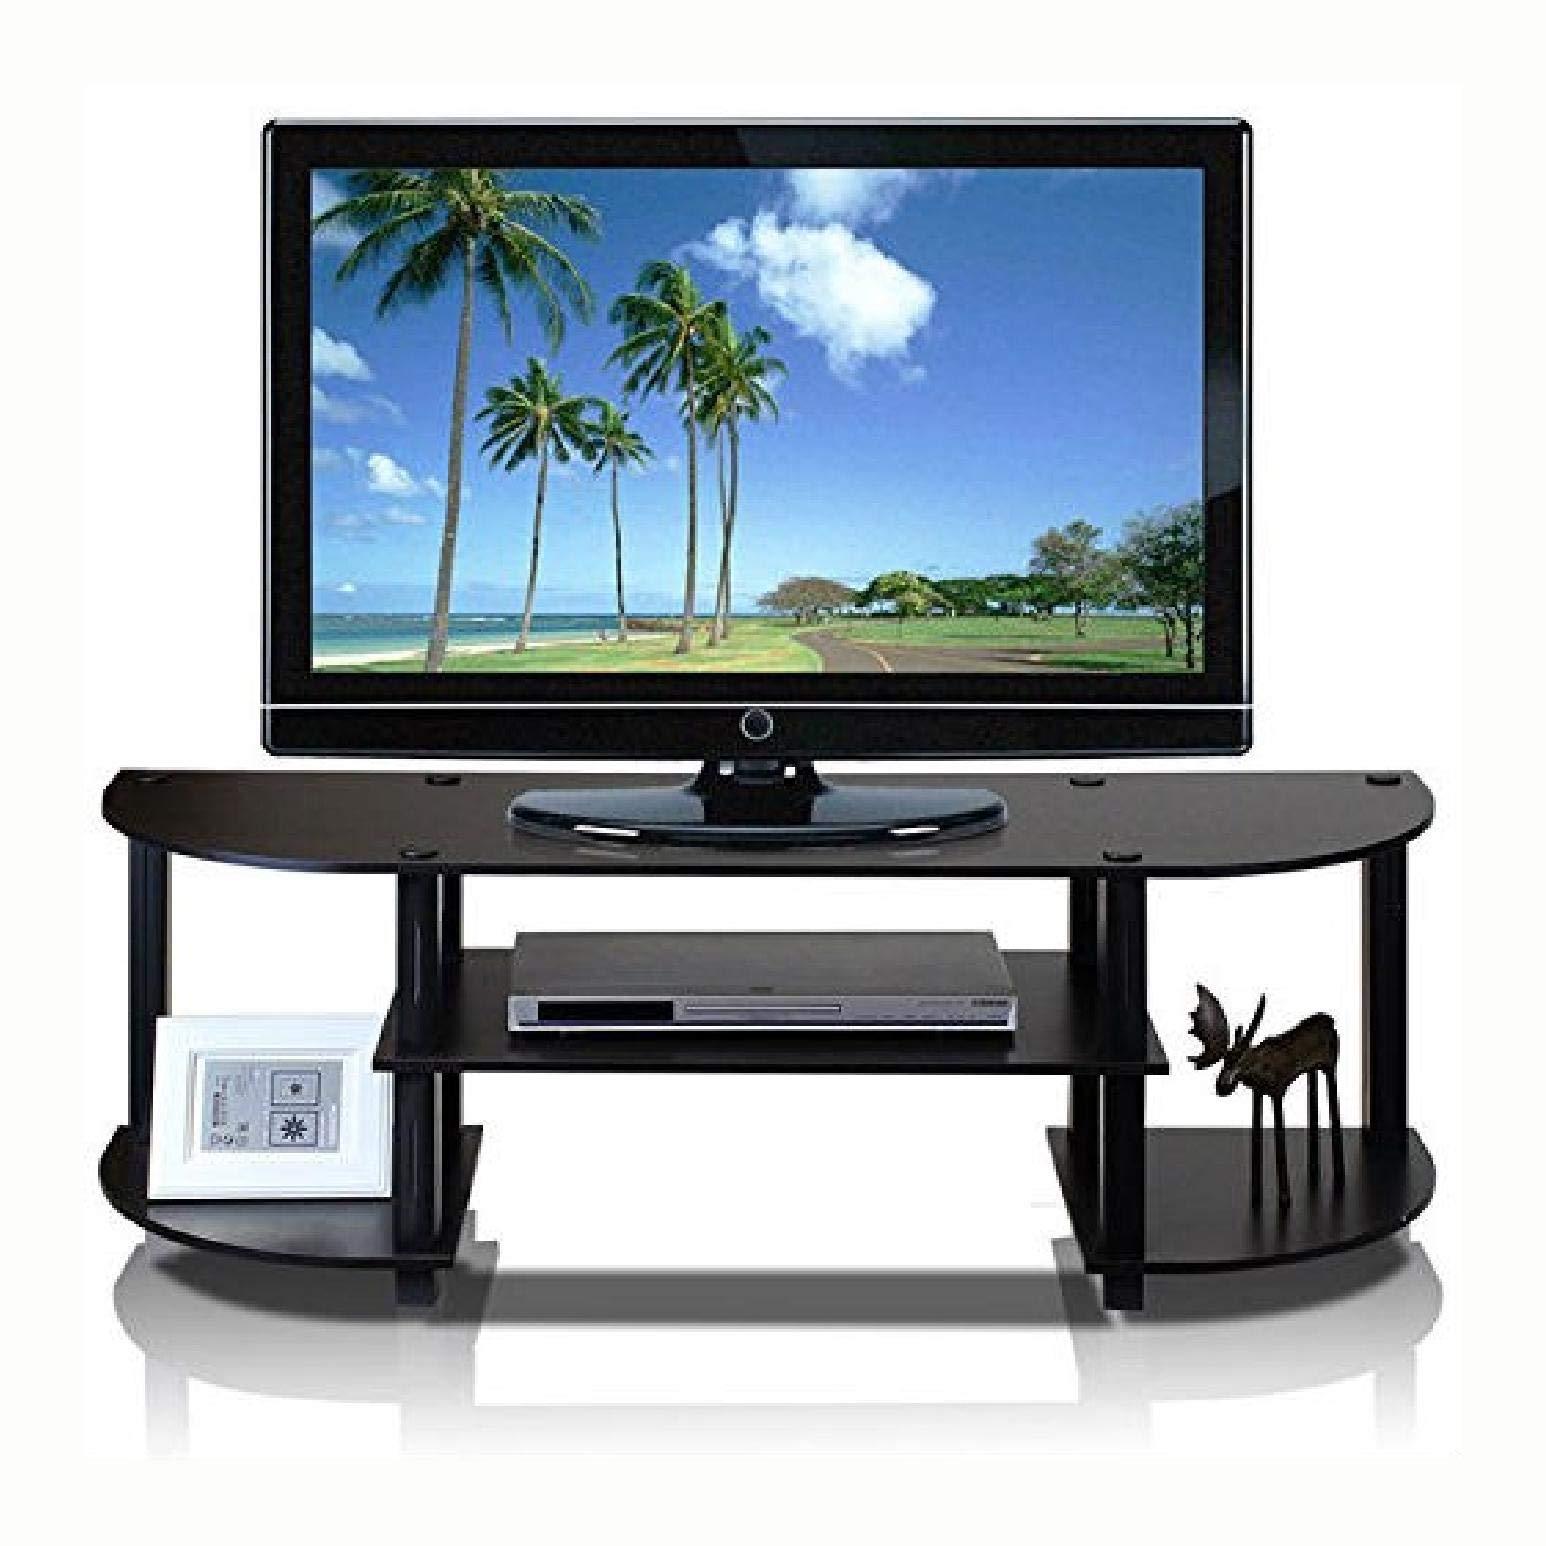 Espresso & Black TV Stand Entertainment Center - Fit up to 42 - inch TV, Espresso & Black TV Stand Entertainment Center - Fits up to 42-inch TV